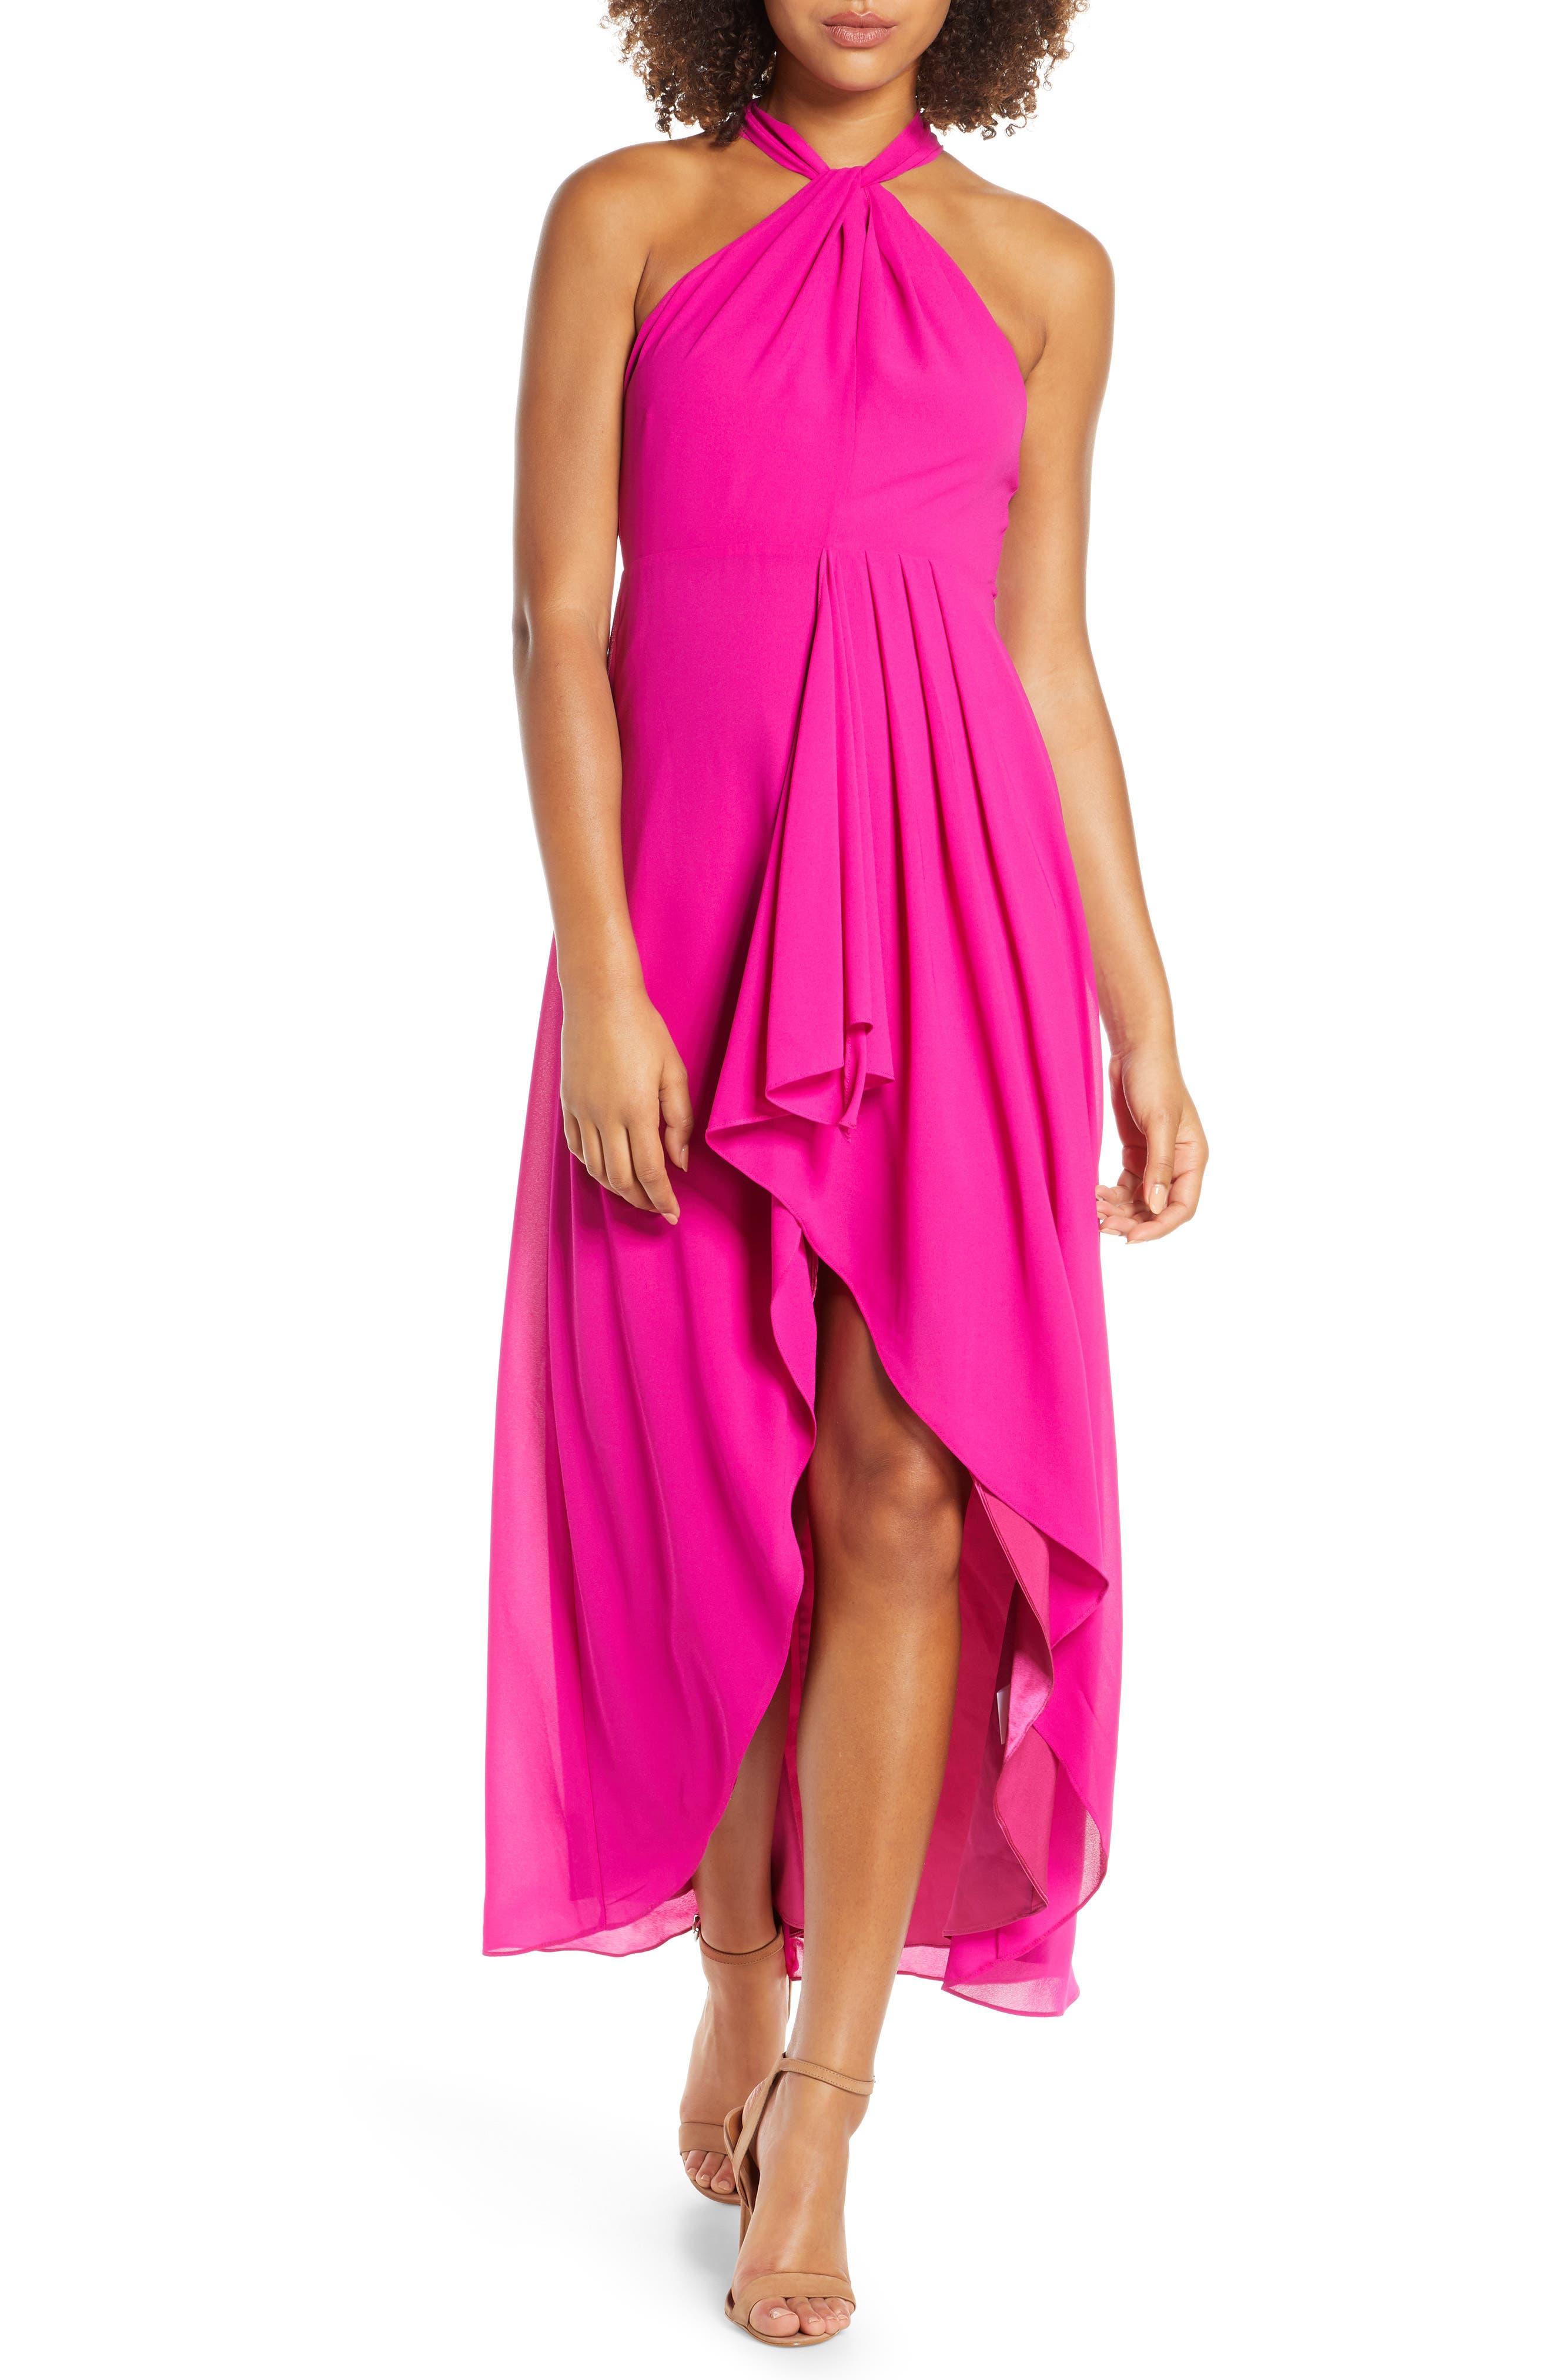 Mark + James By Badgley Mischka High/low Halter Dress, Pink